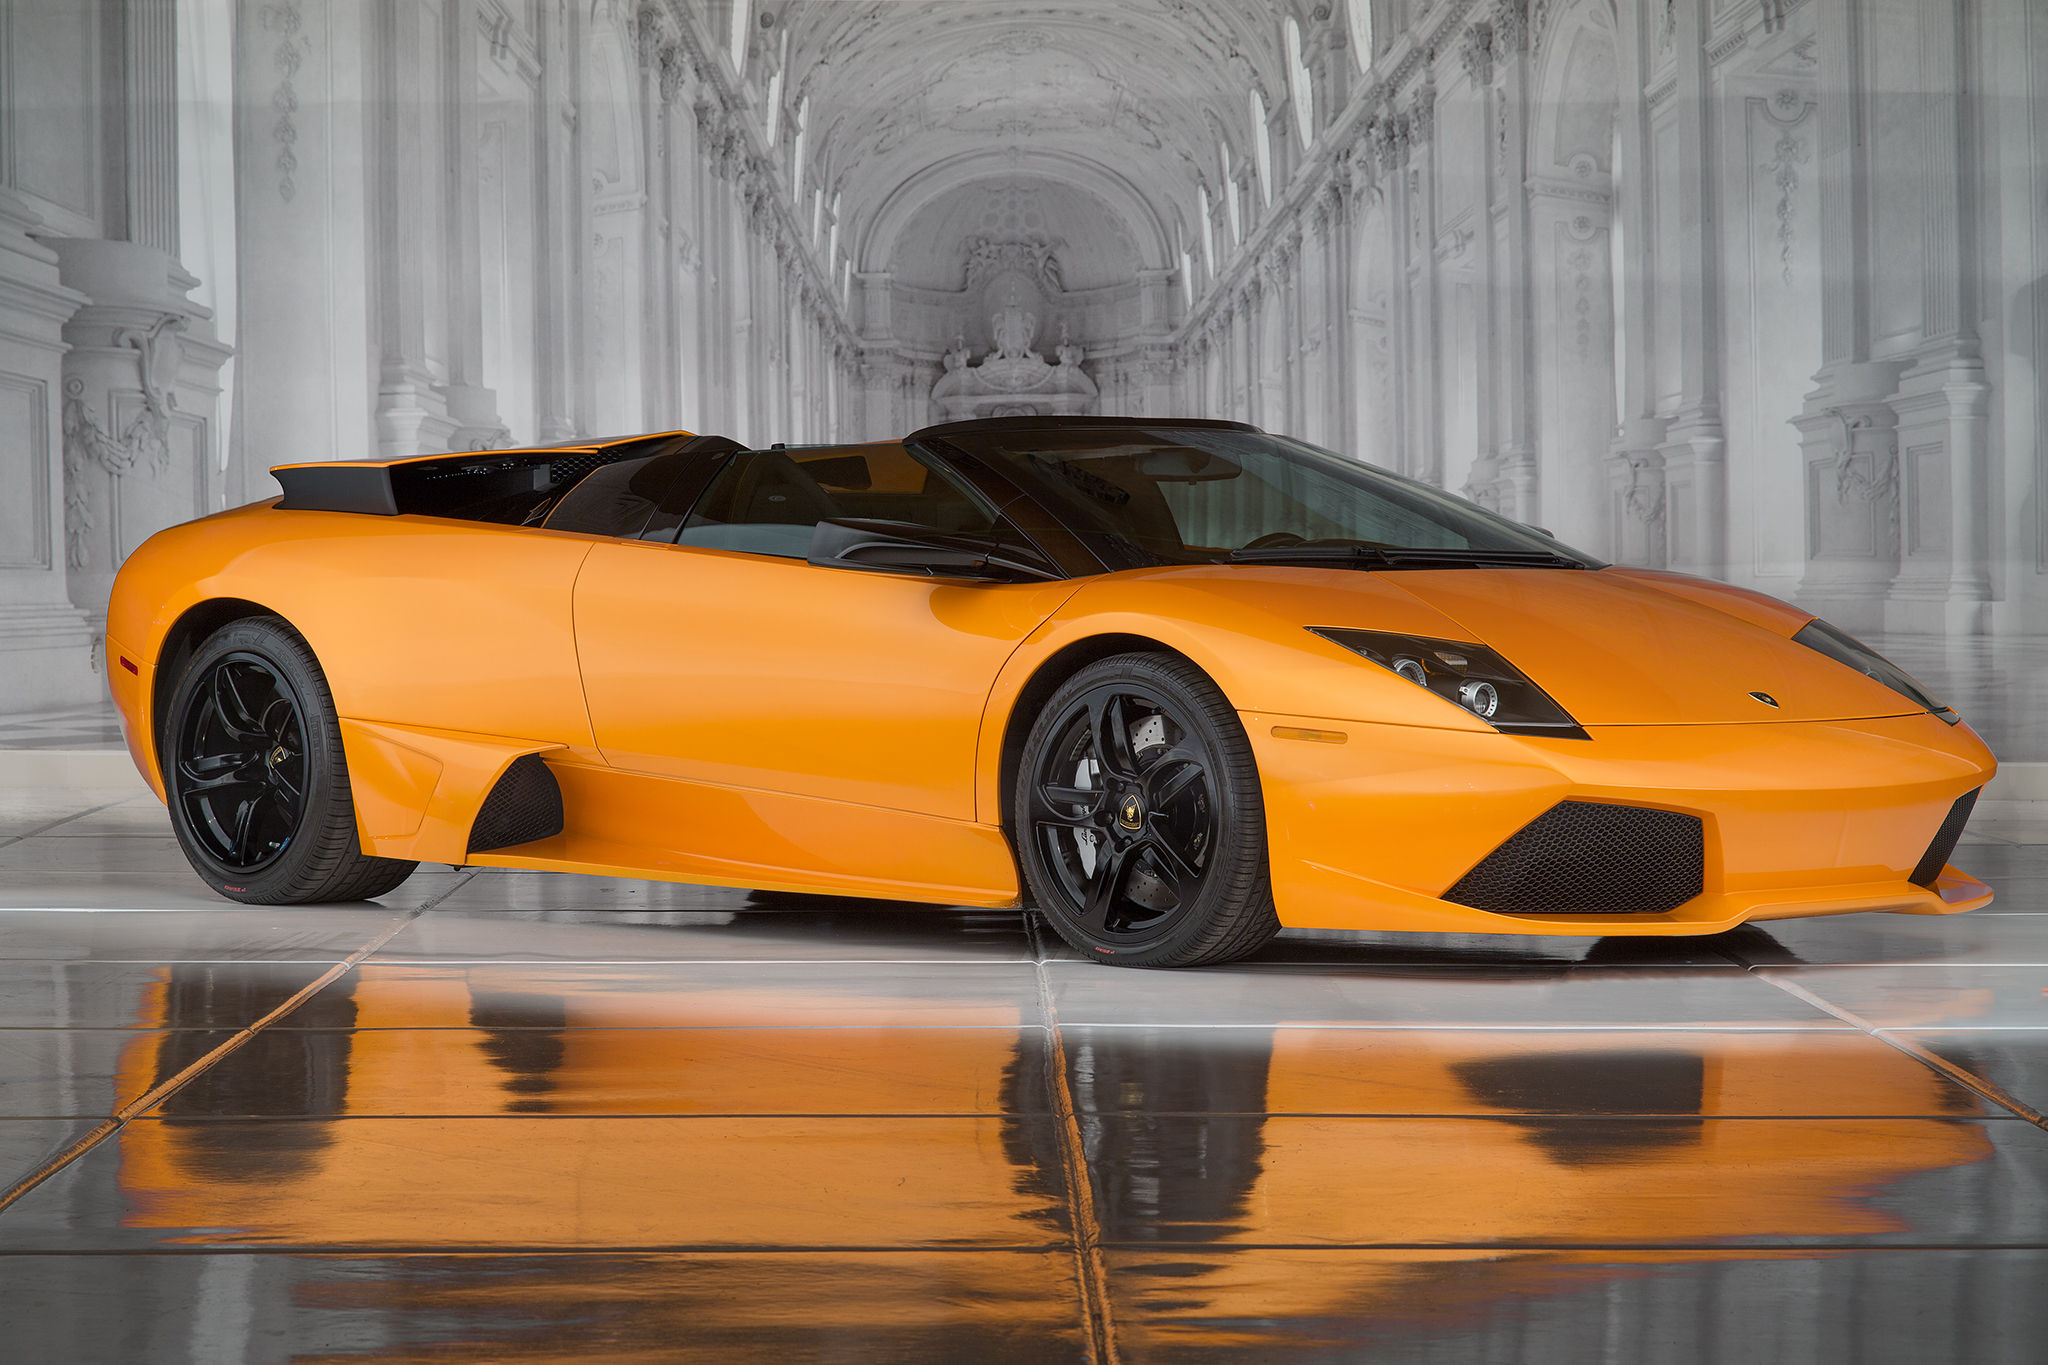 Lamborghini Murcielago Lp640 4 Chris Lambeth